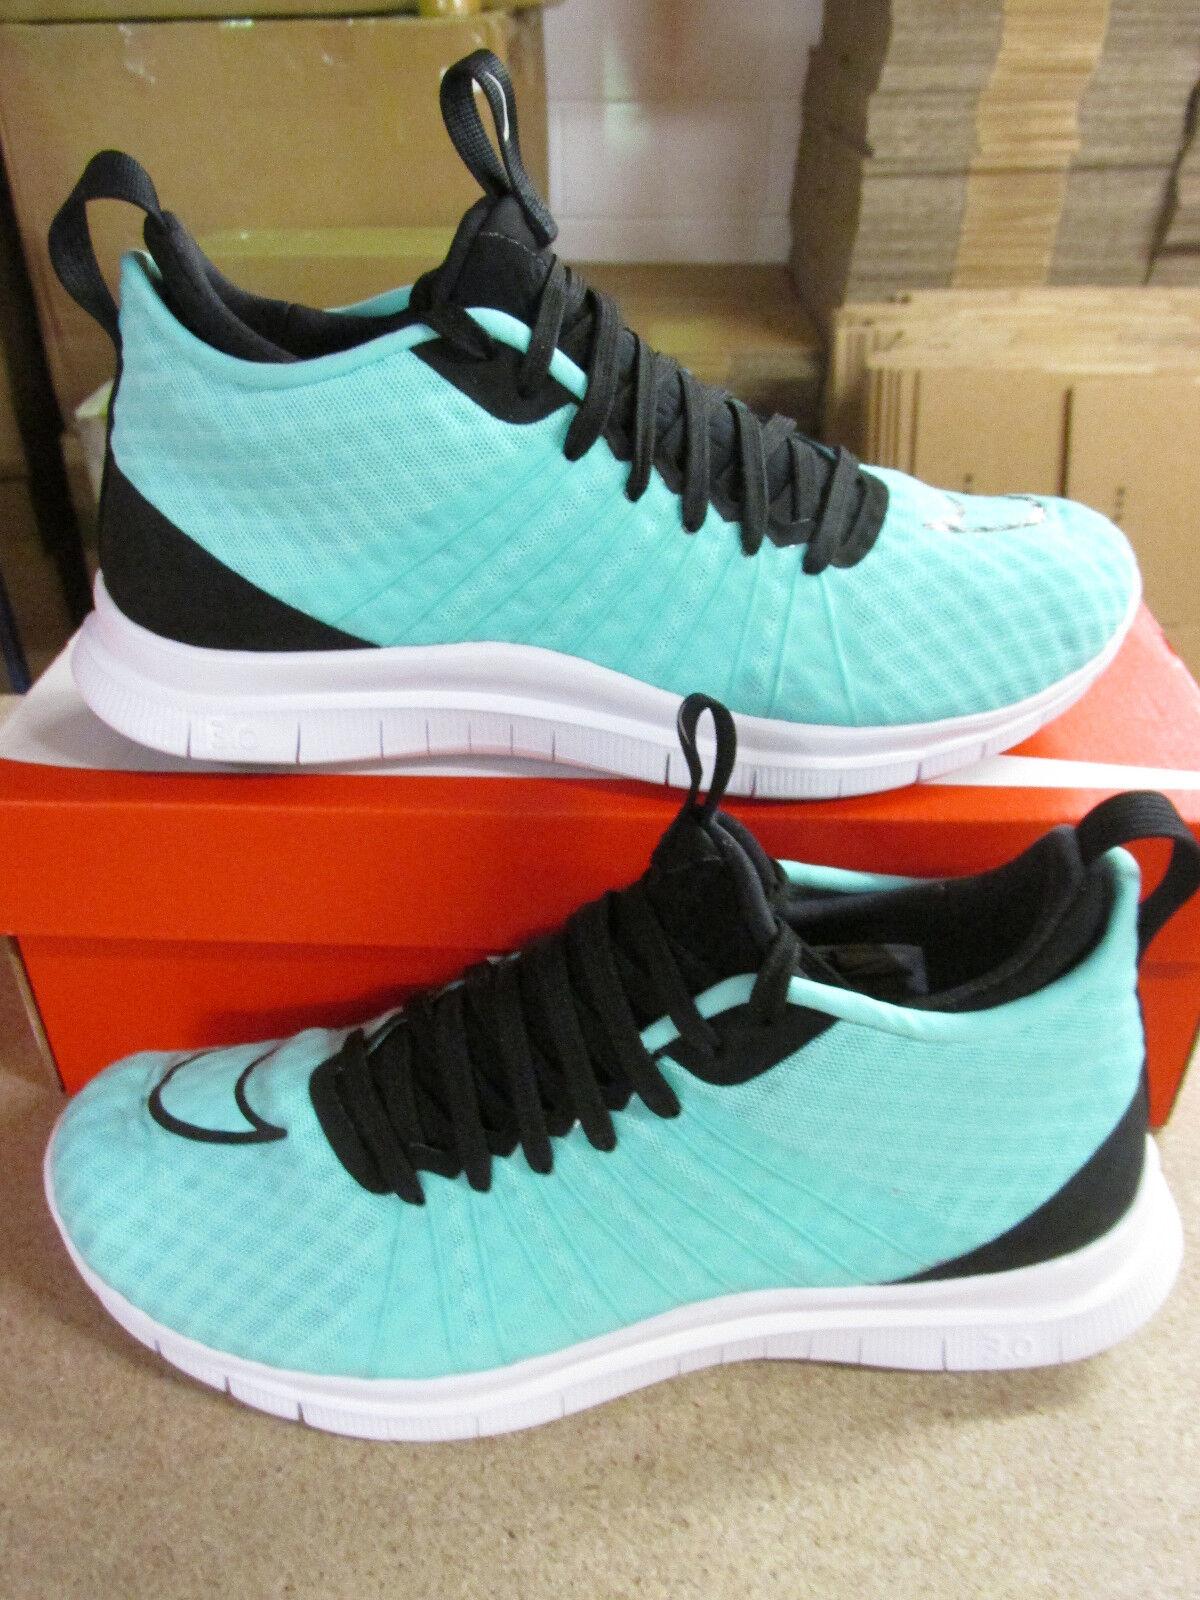 outlet store 94e70 c3b93 Nike Free Free Free hypervenom 2 Hombre Trainers 747139 300 Zapatillas  Zapatos los zapatos mas populares